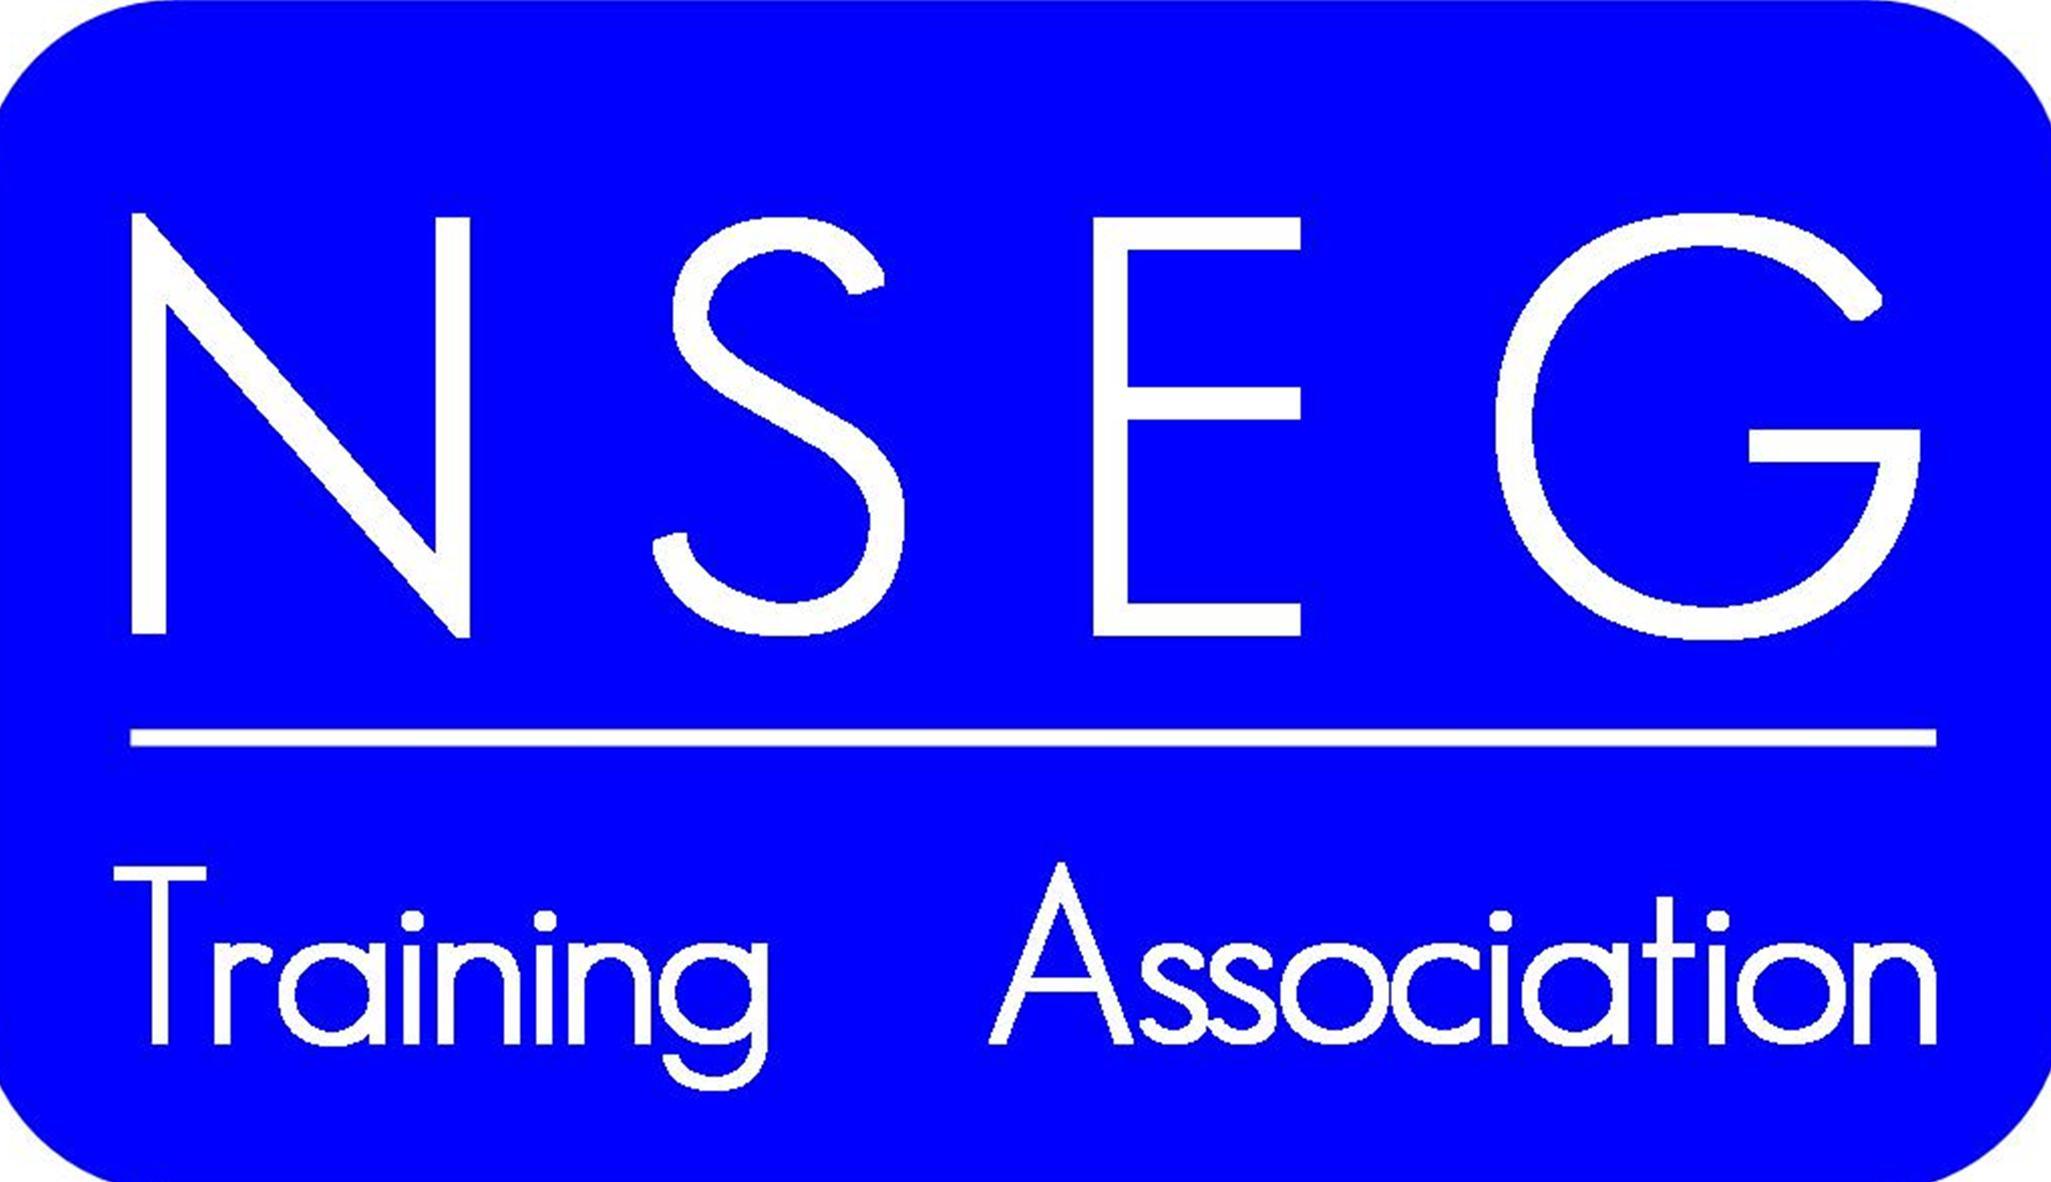 NSEGTA Logo